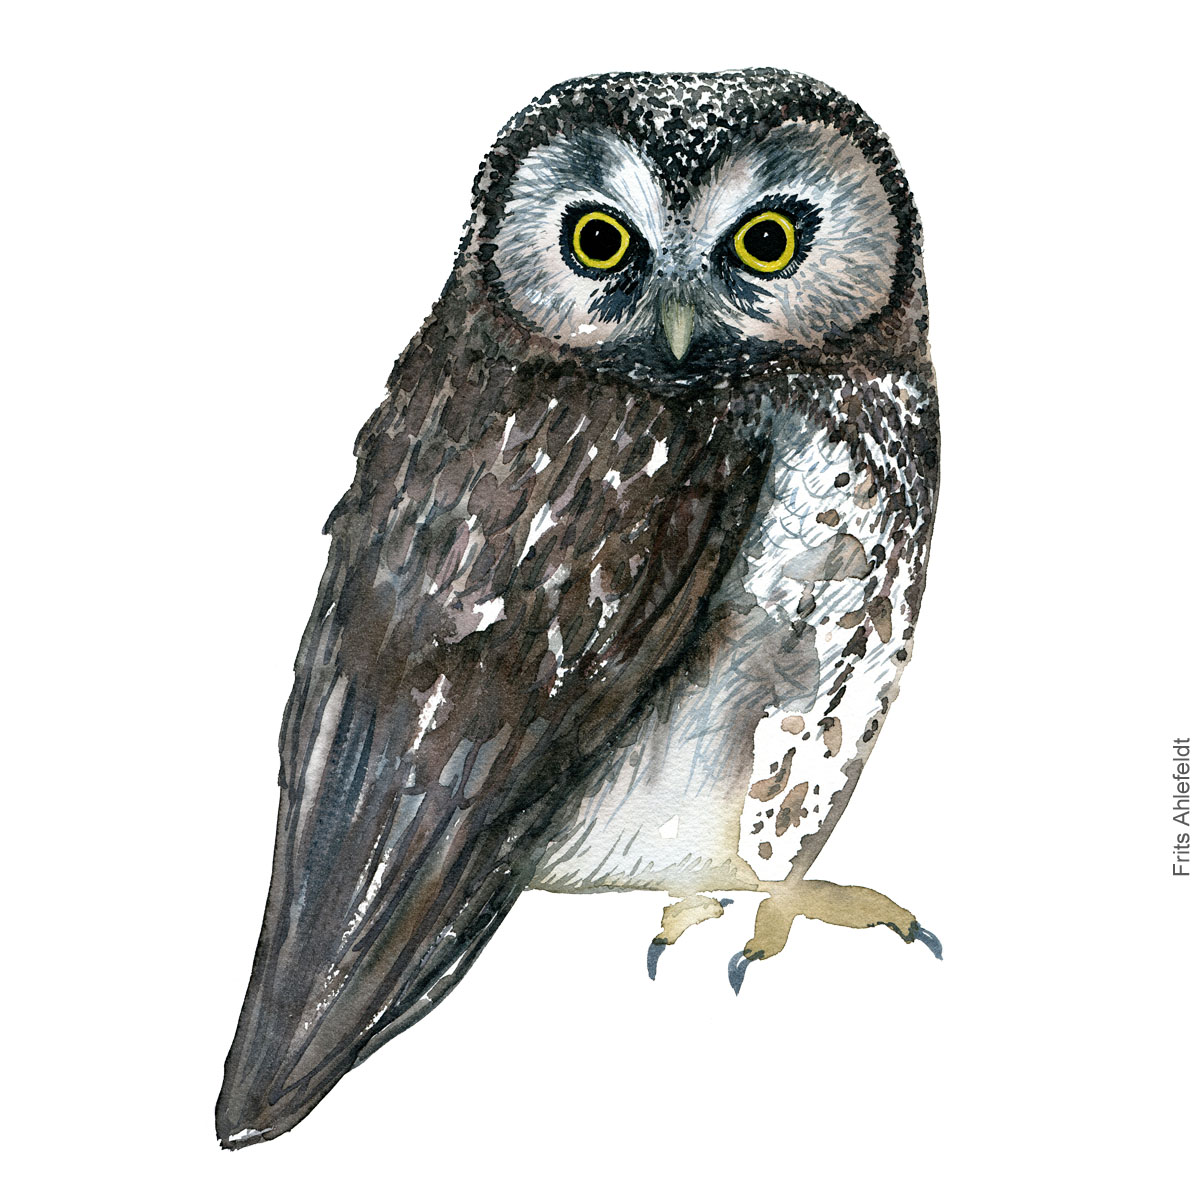 Perleugle - Boreal owl - Bird watercolor painting. Artwork by Frits Ahlefeldt. Fugle akvarel